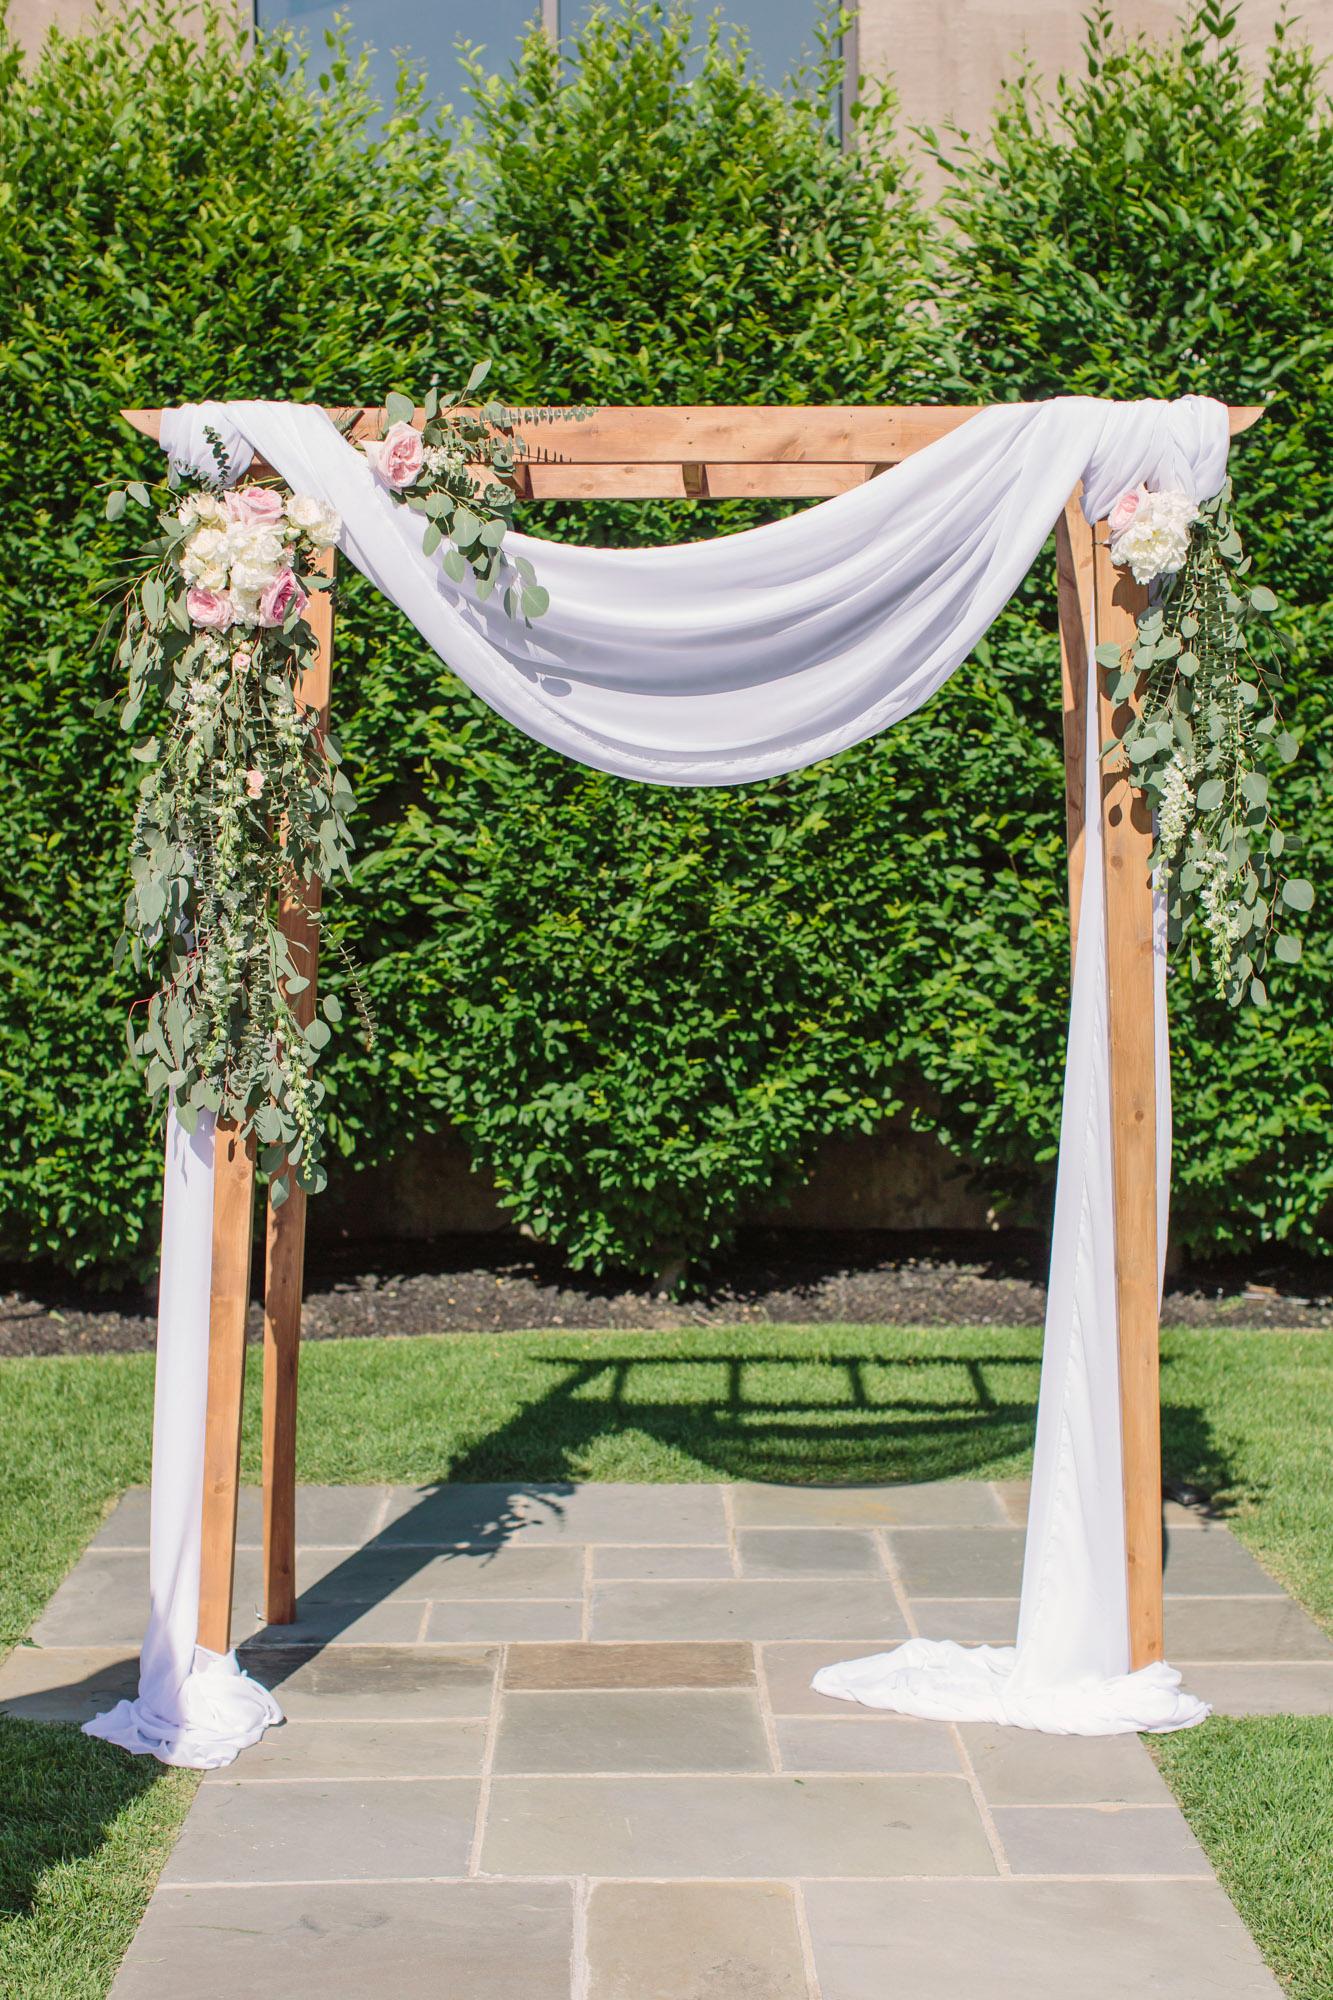 40a_Rowan_Brian_The_Roundhouse_Wedding_Beacon_NY_Tanya_Salazar_Photography_1092.jpg